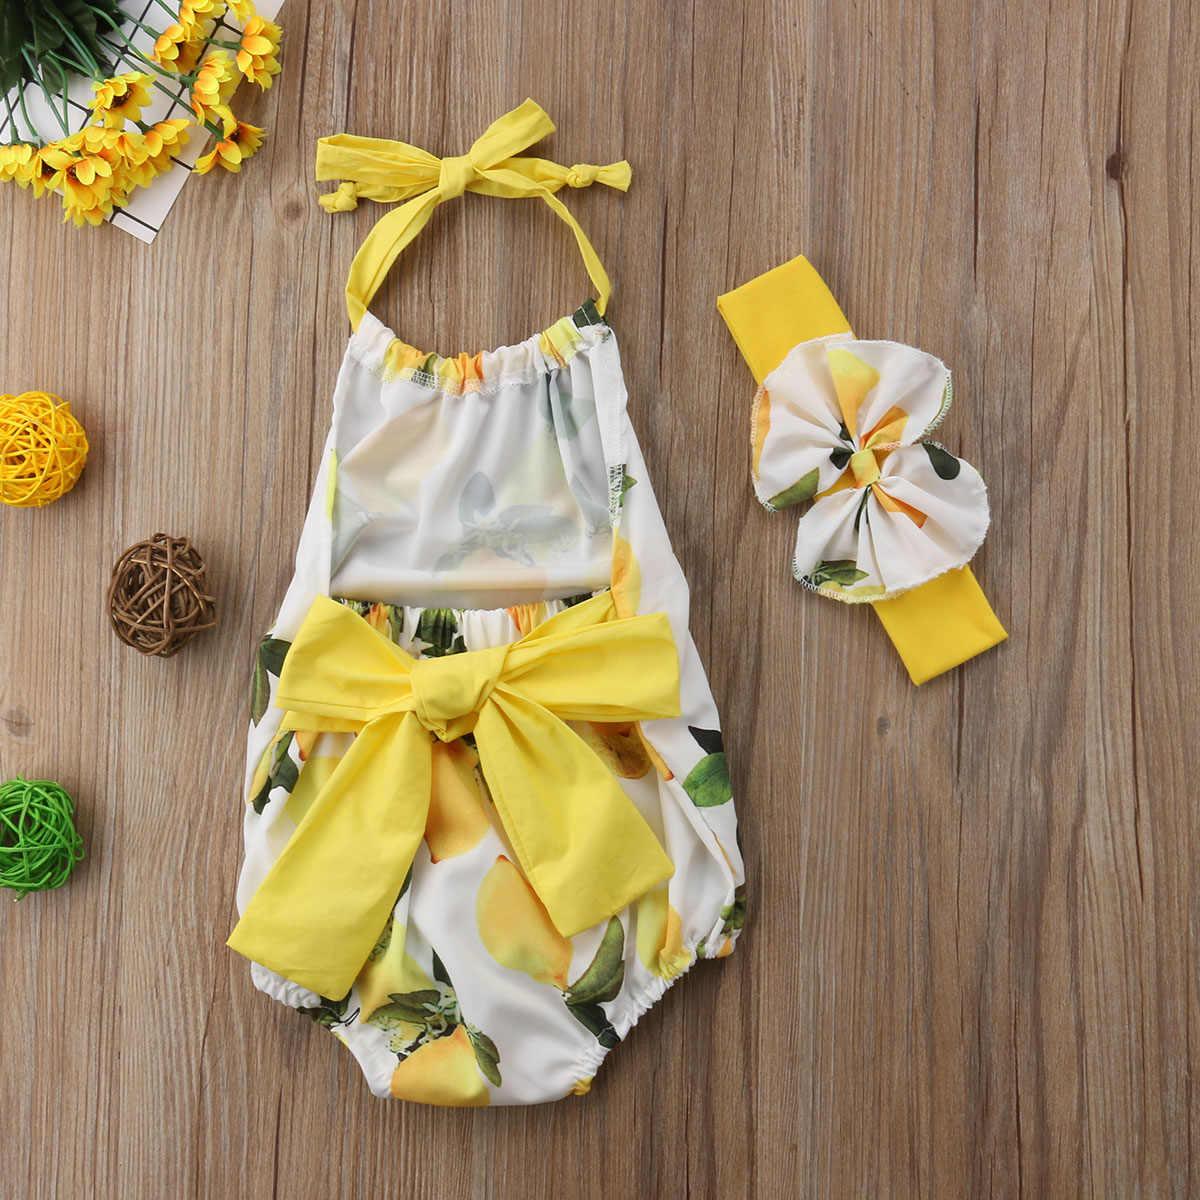 PRINTING geel Pasgeboren Baby Baby Meisjes Riem Mango Bodysuit Jumpsuit Outfits 0-24 m mouwloze zomer zoete mooie CH